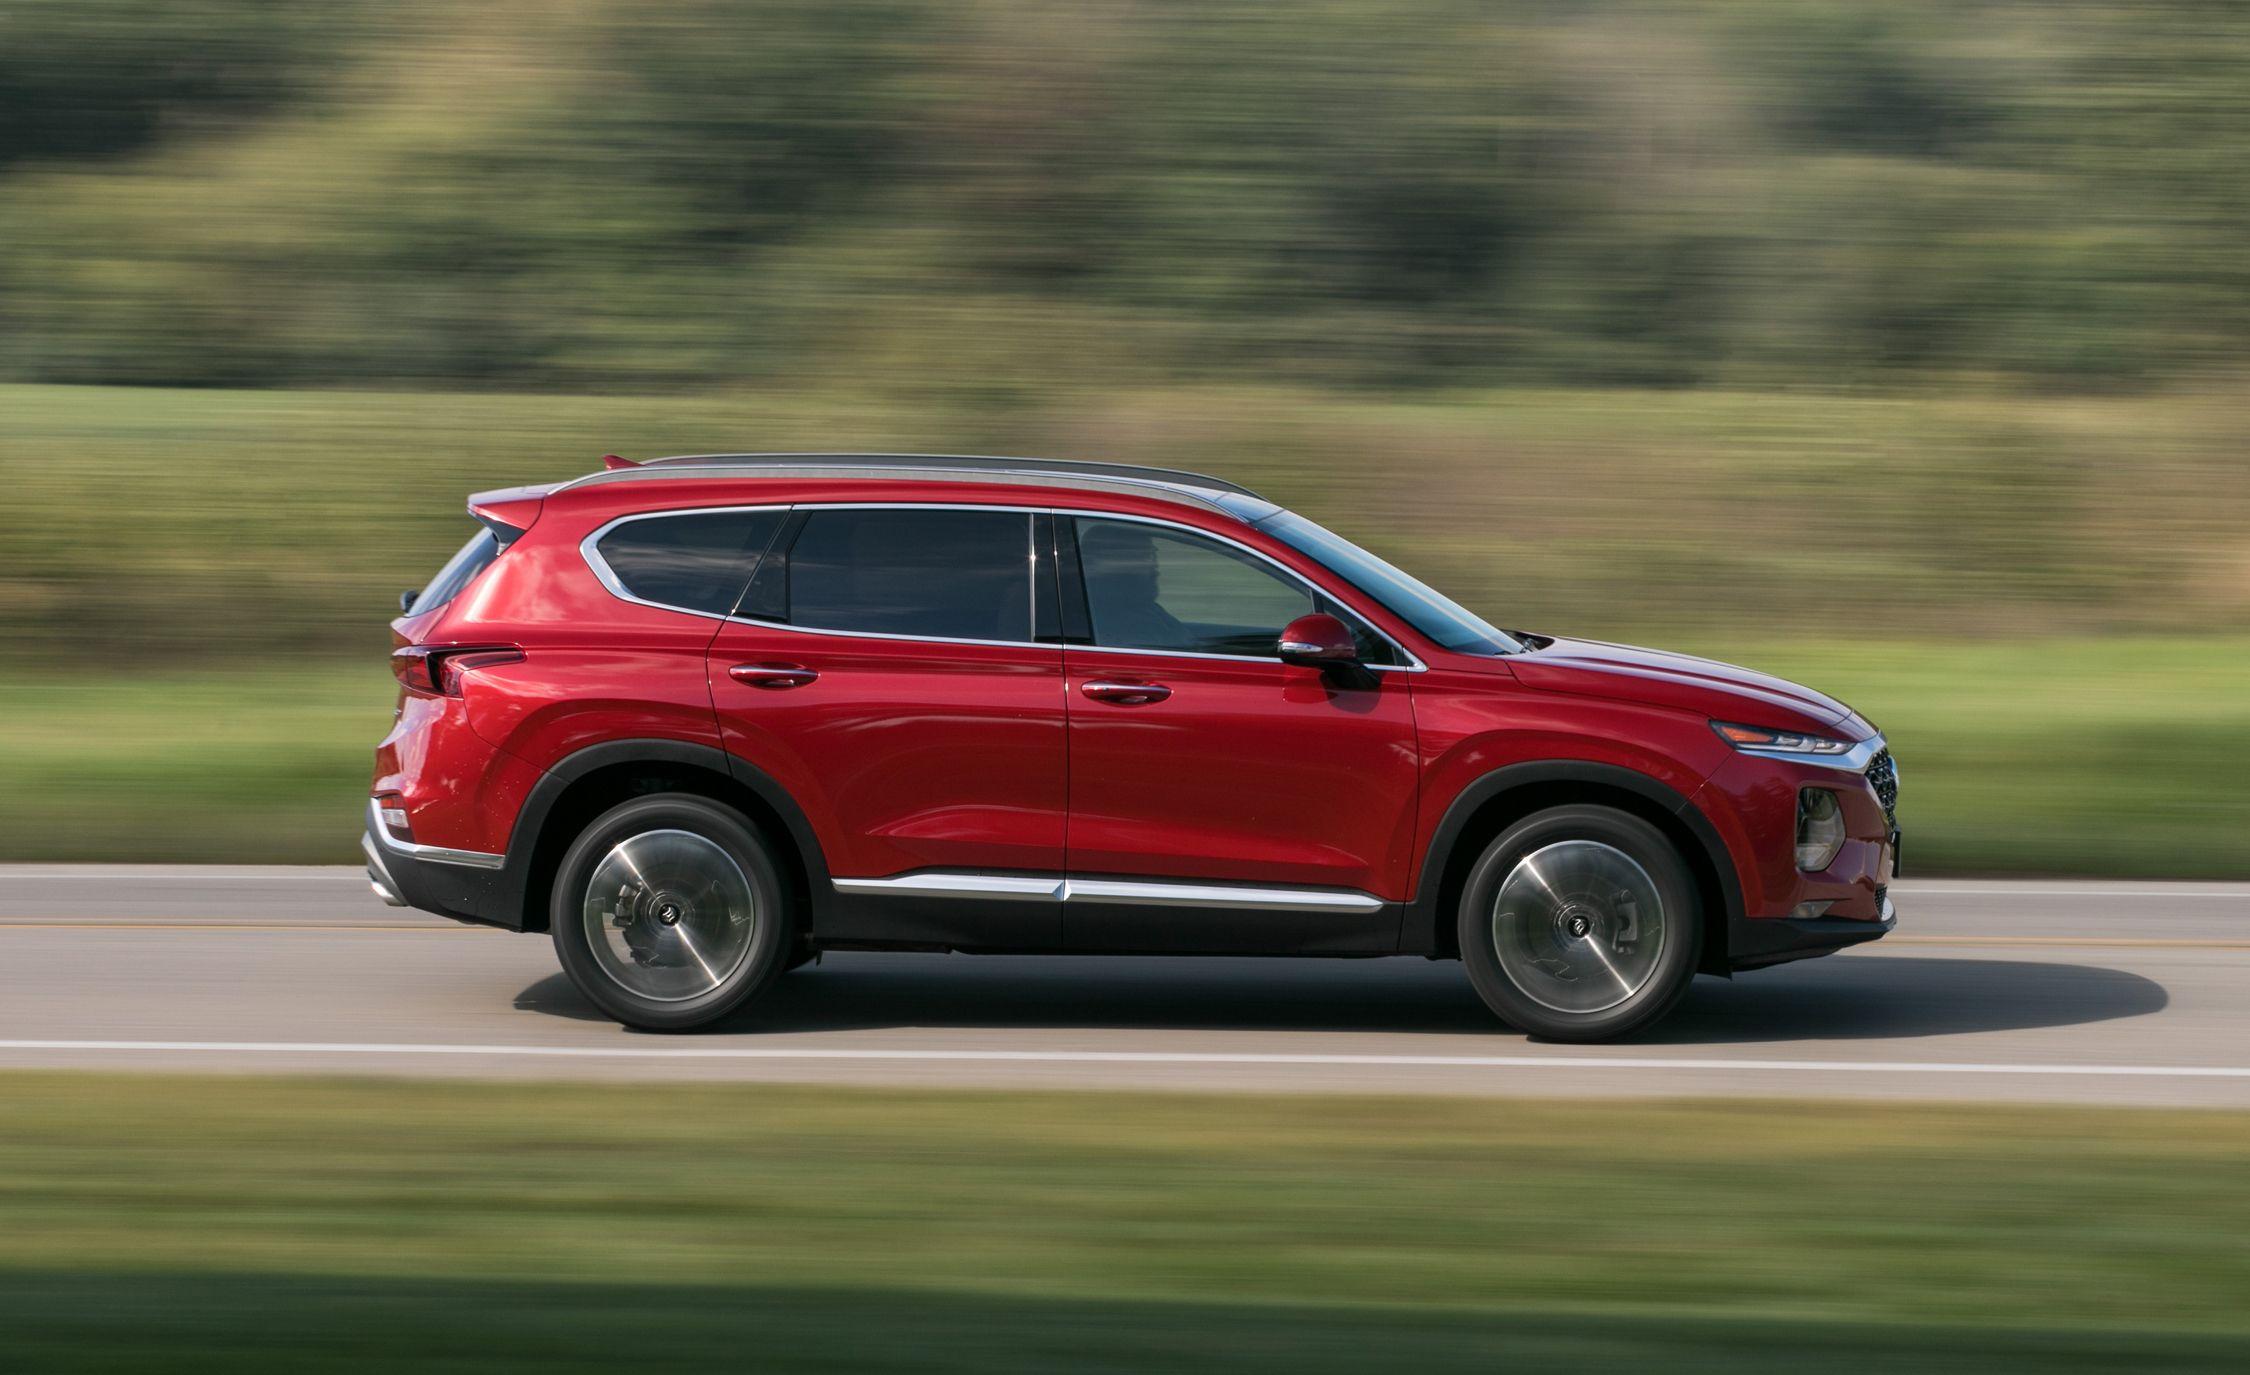 2019 Hyundai Santa Fe A Practical Mid Size Suv